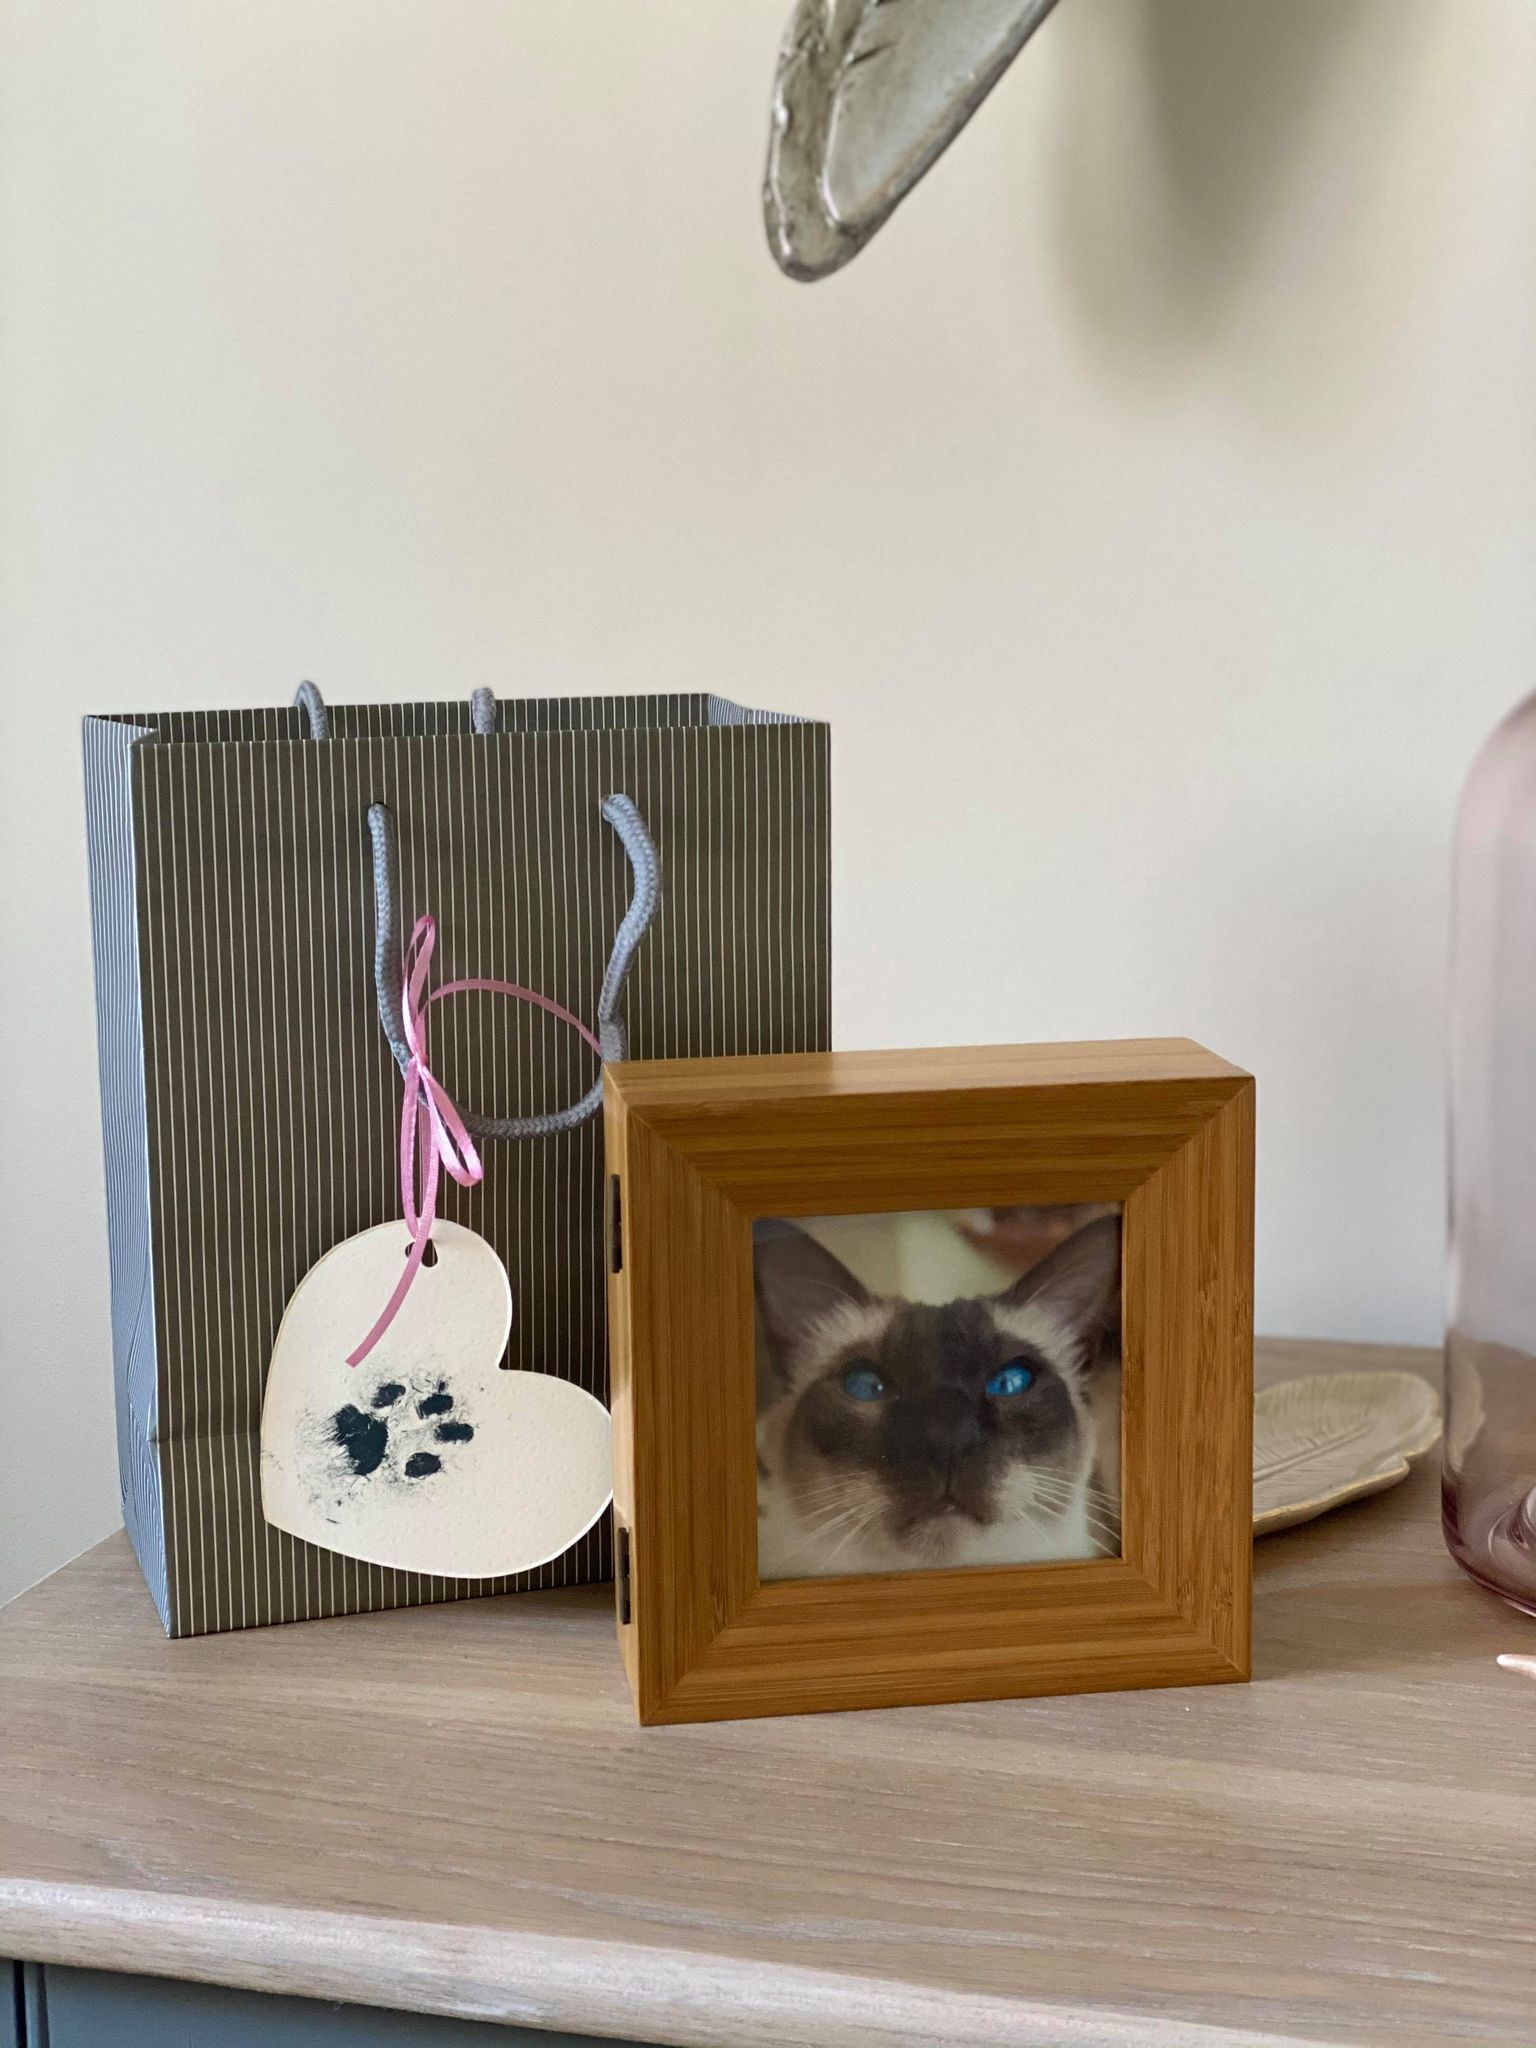 Beautiful cat photo frame and keepsake gift bag with pet paw print